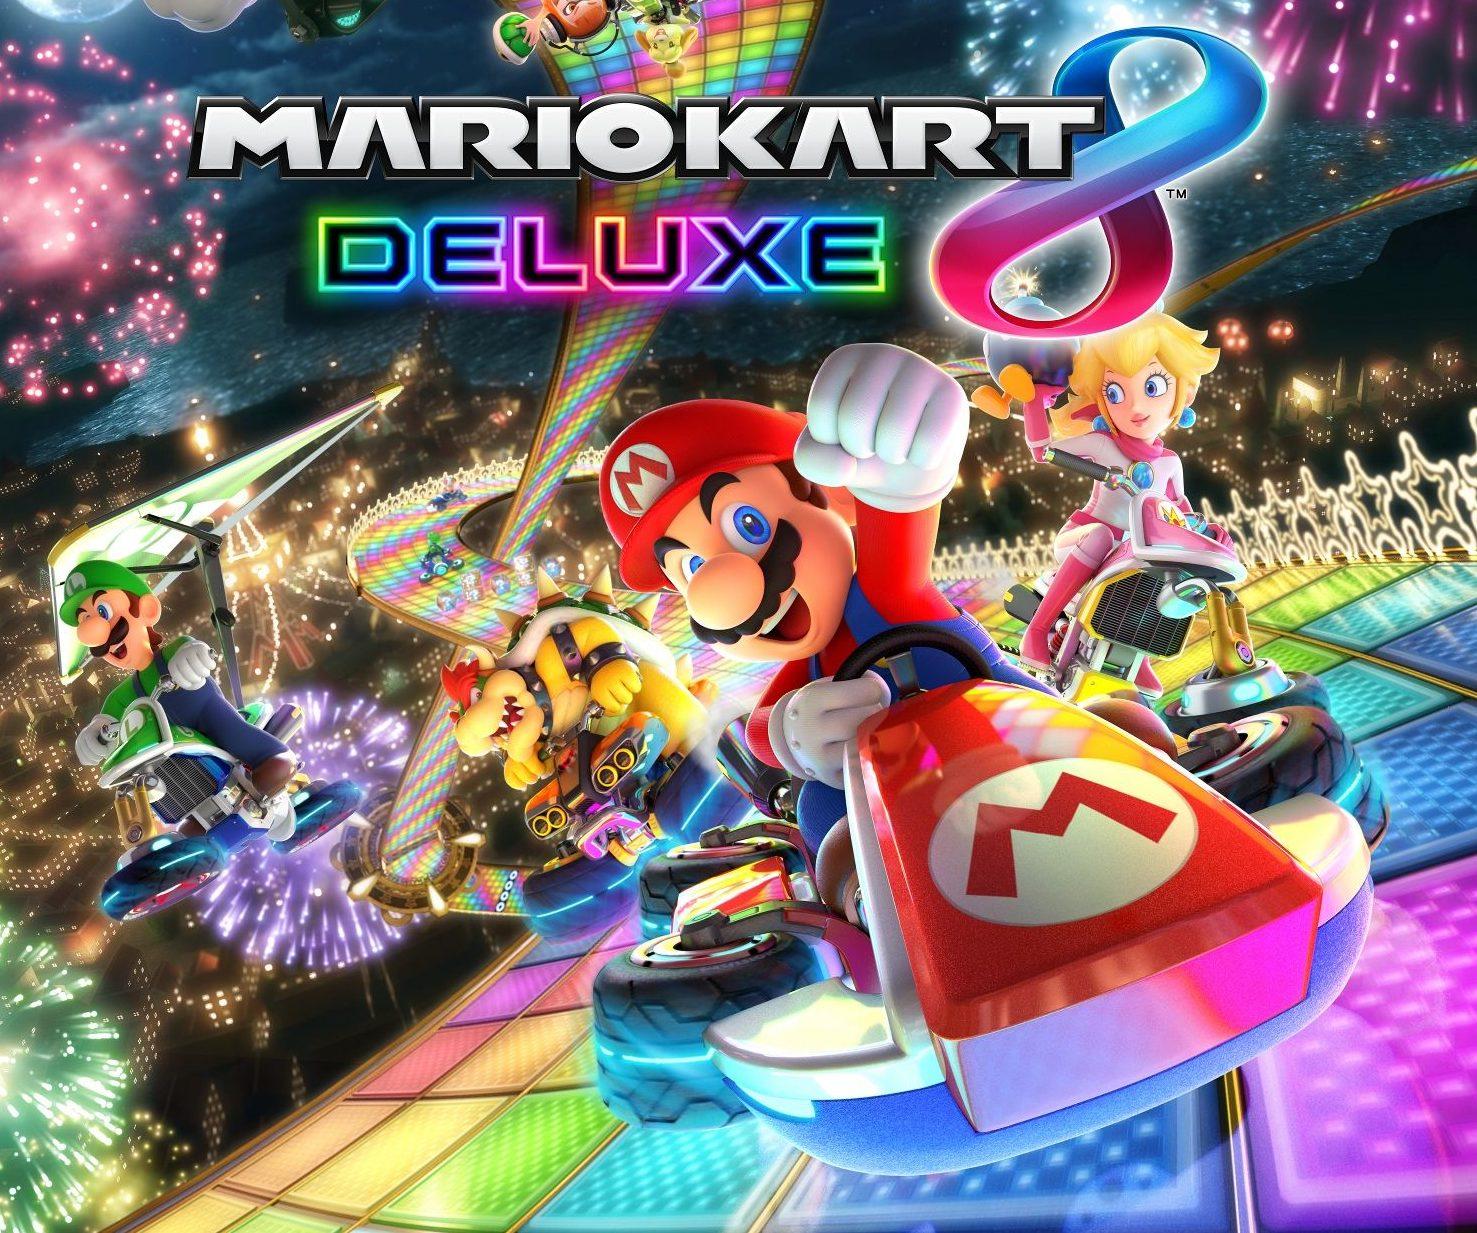 Mario Kart 8 Deluxe review – kart d'or